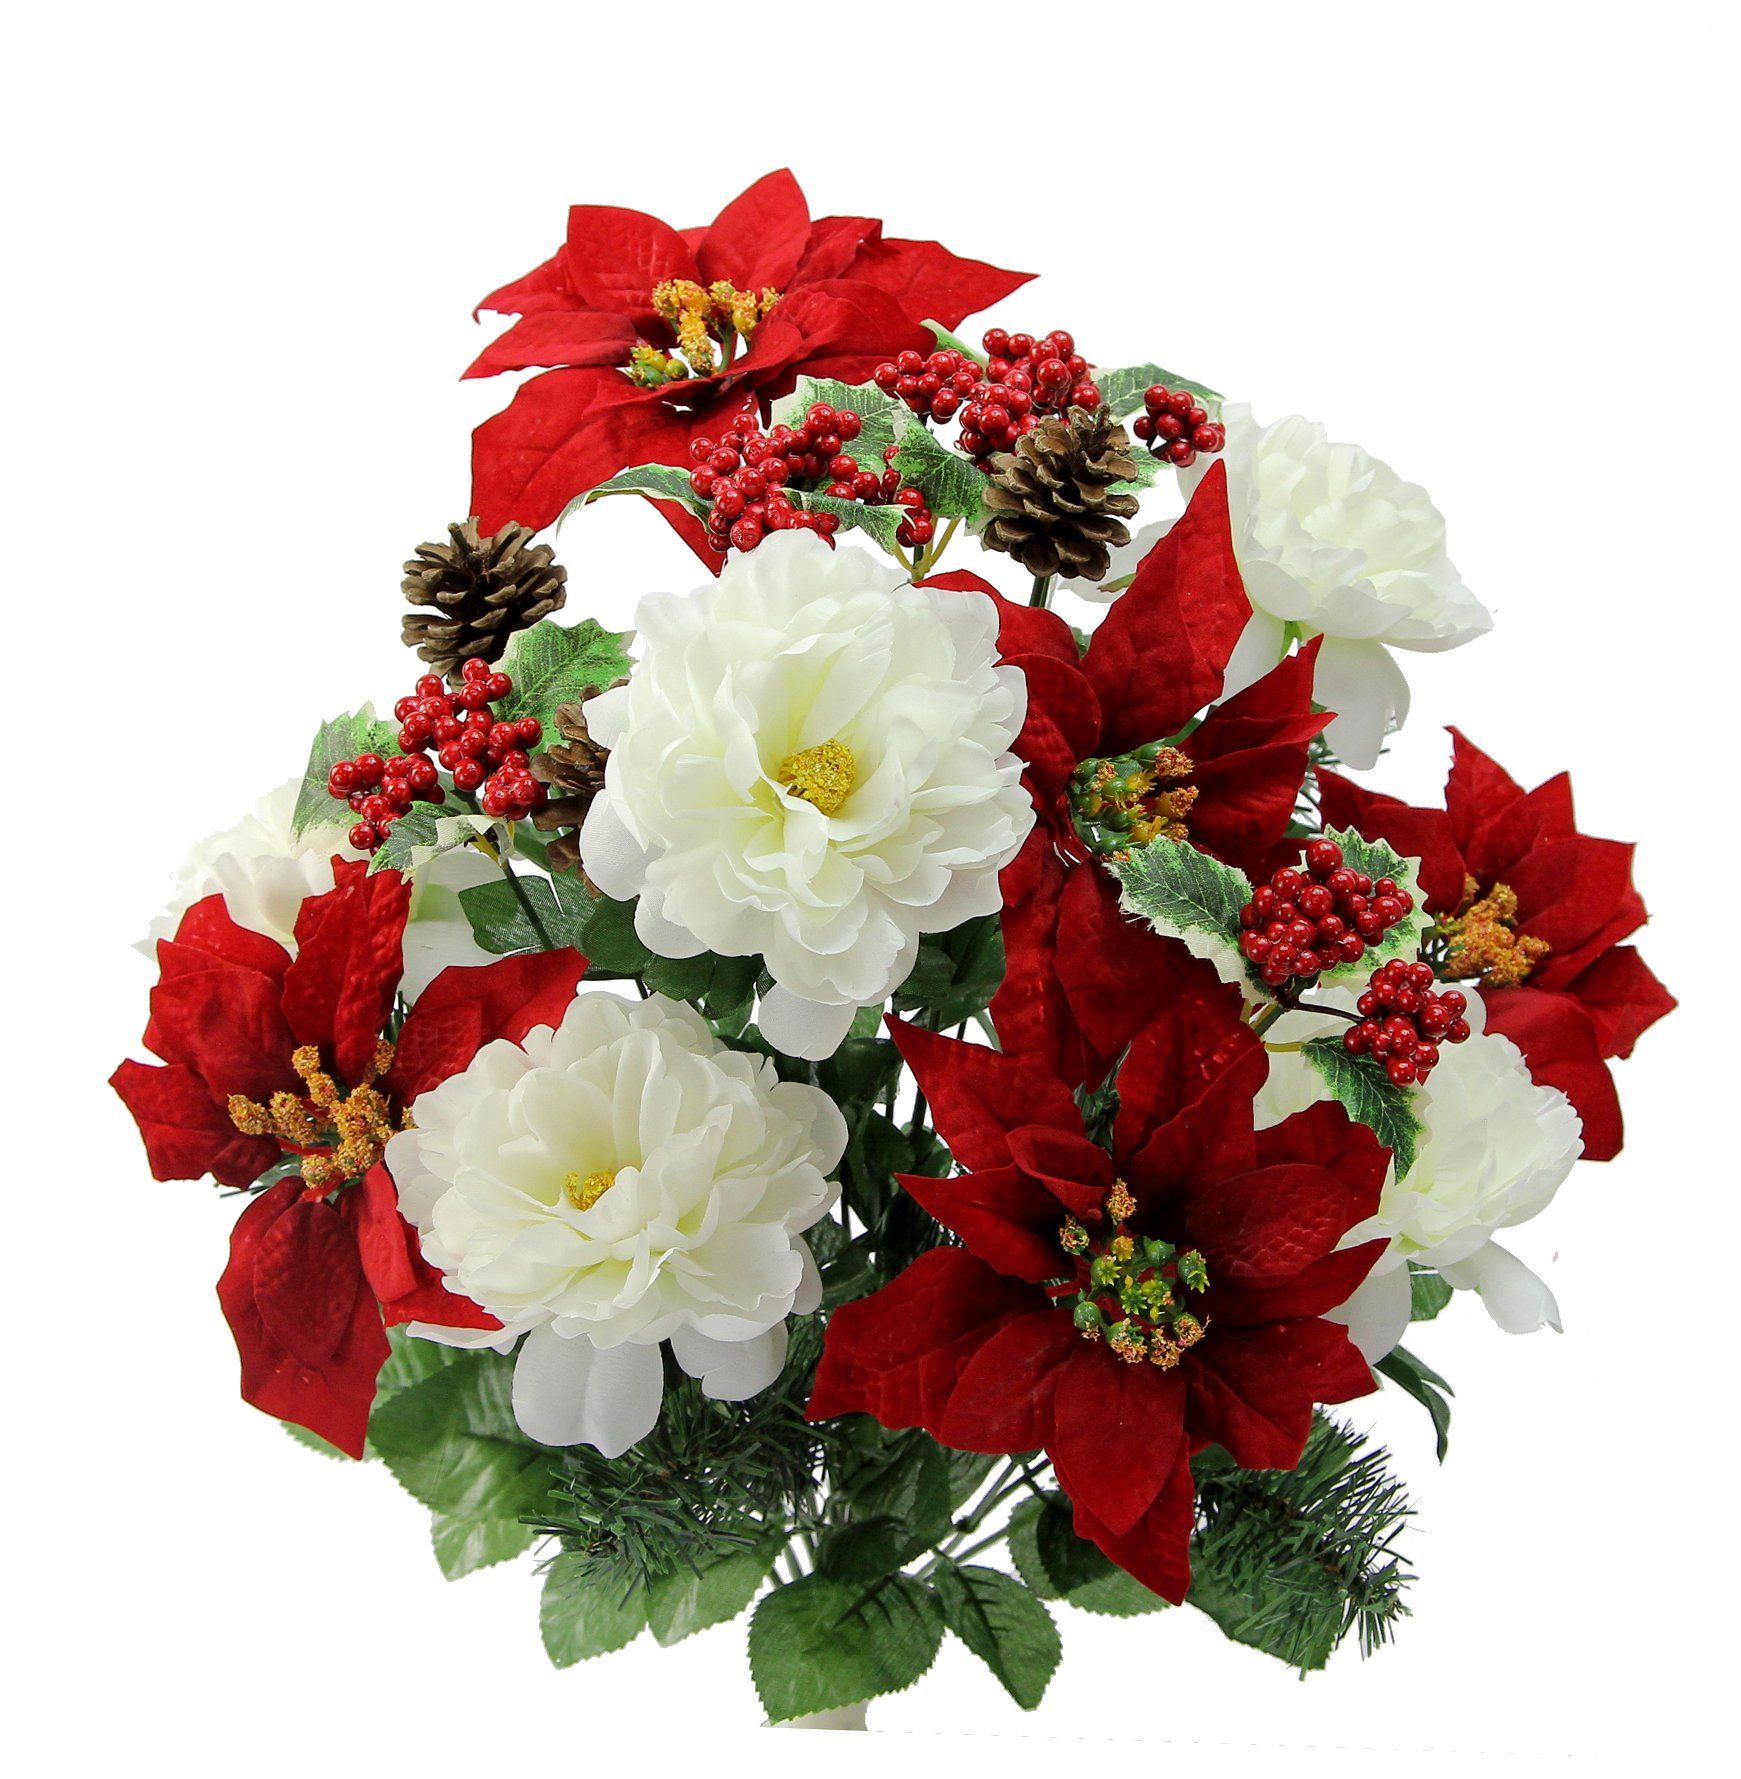 silk flower arrangements admired by nature gpb6816-rd/cm artificial flower bush, peony poinsettias-rd/cm